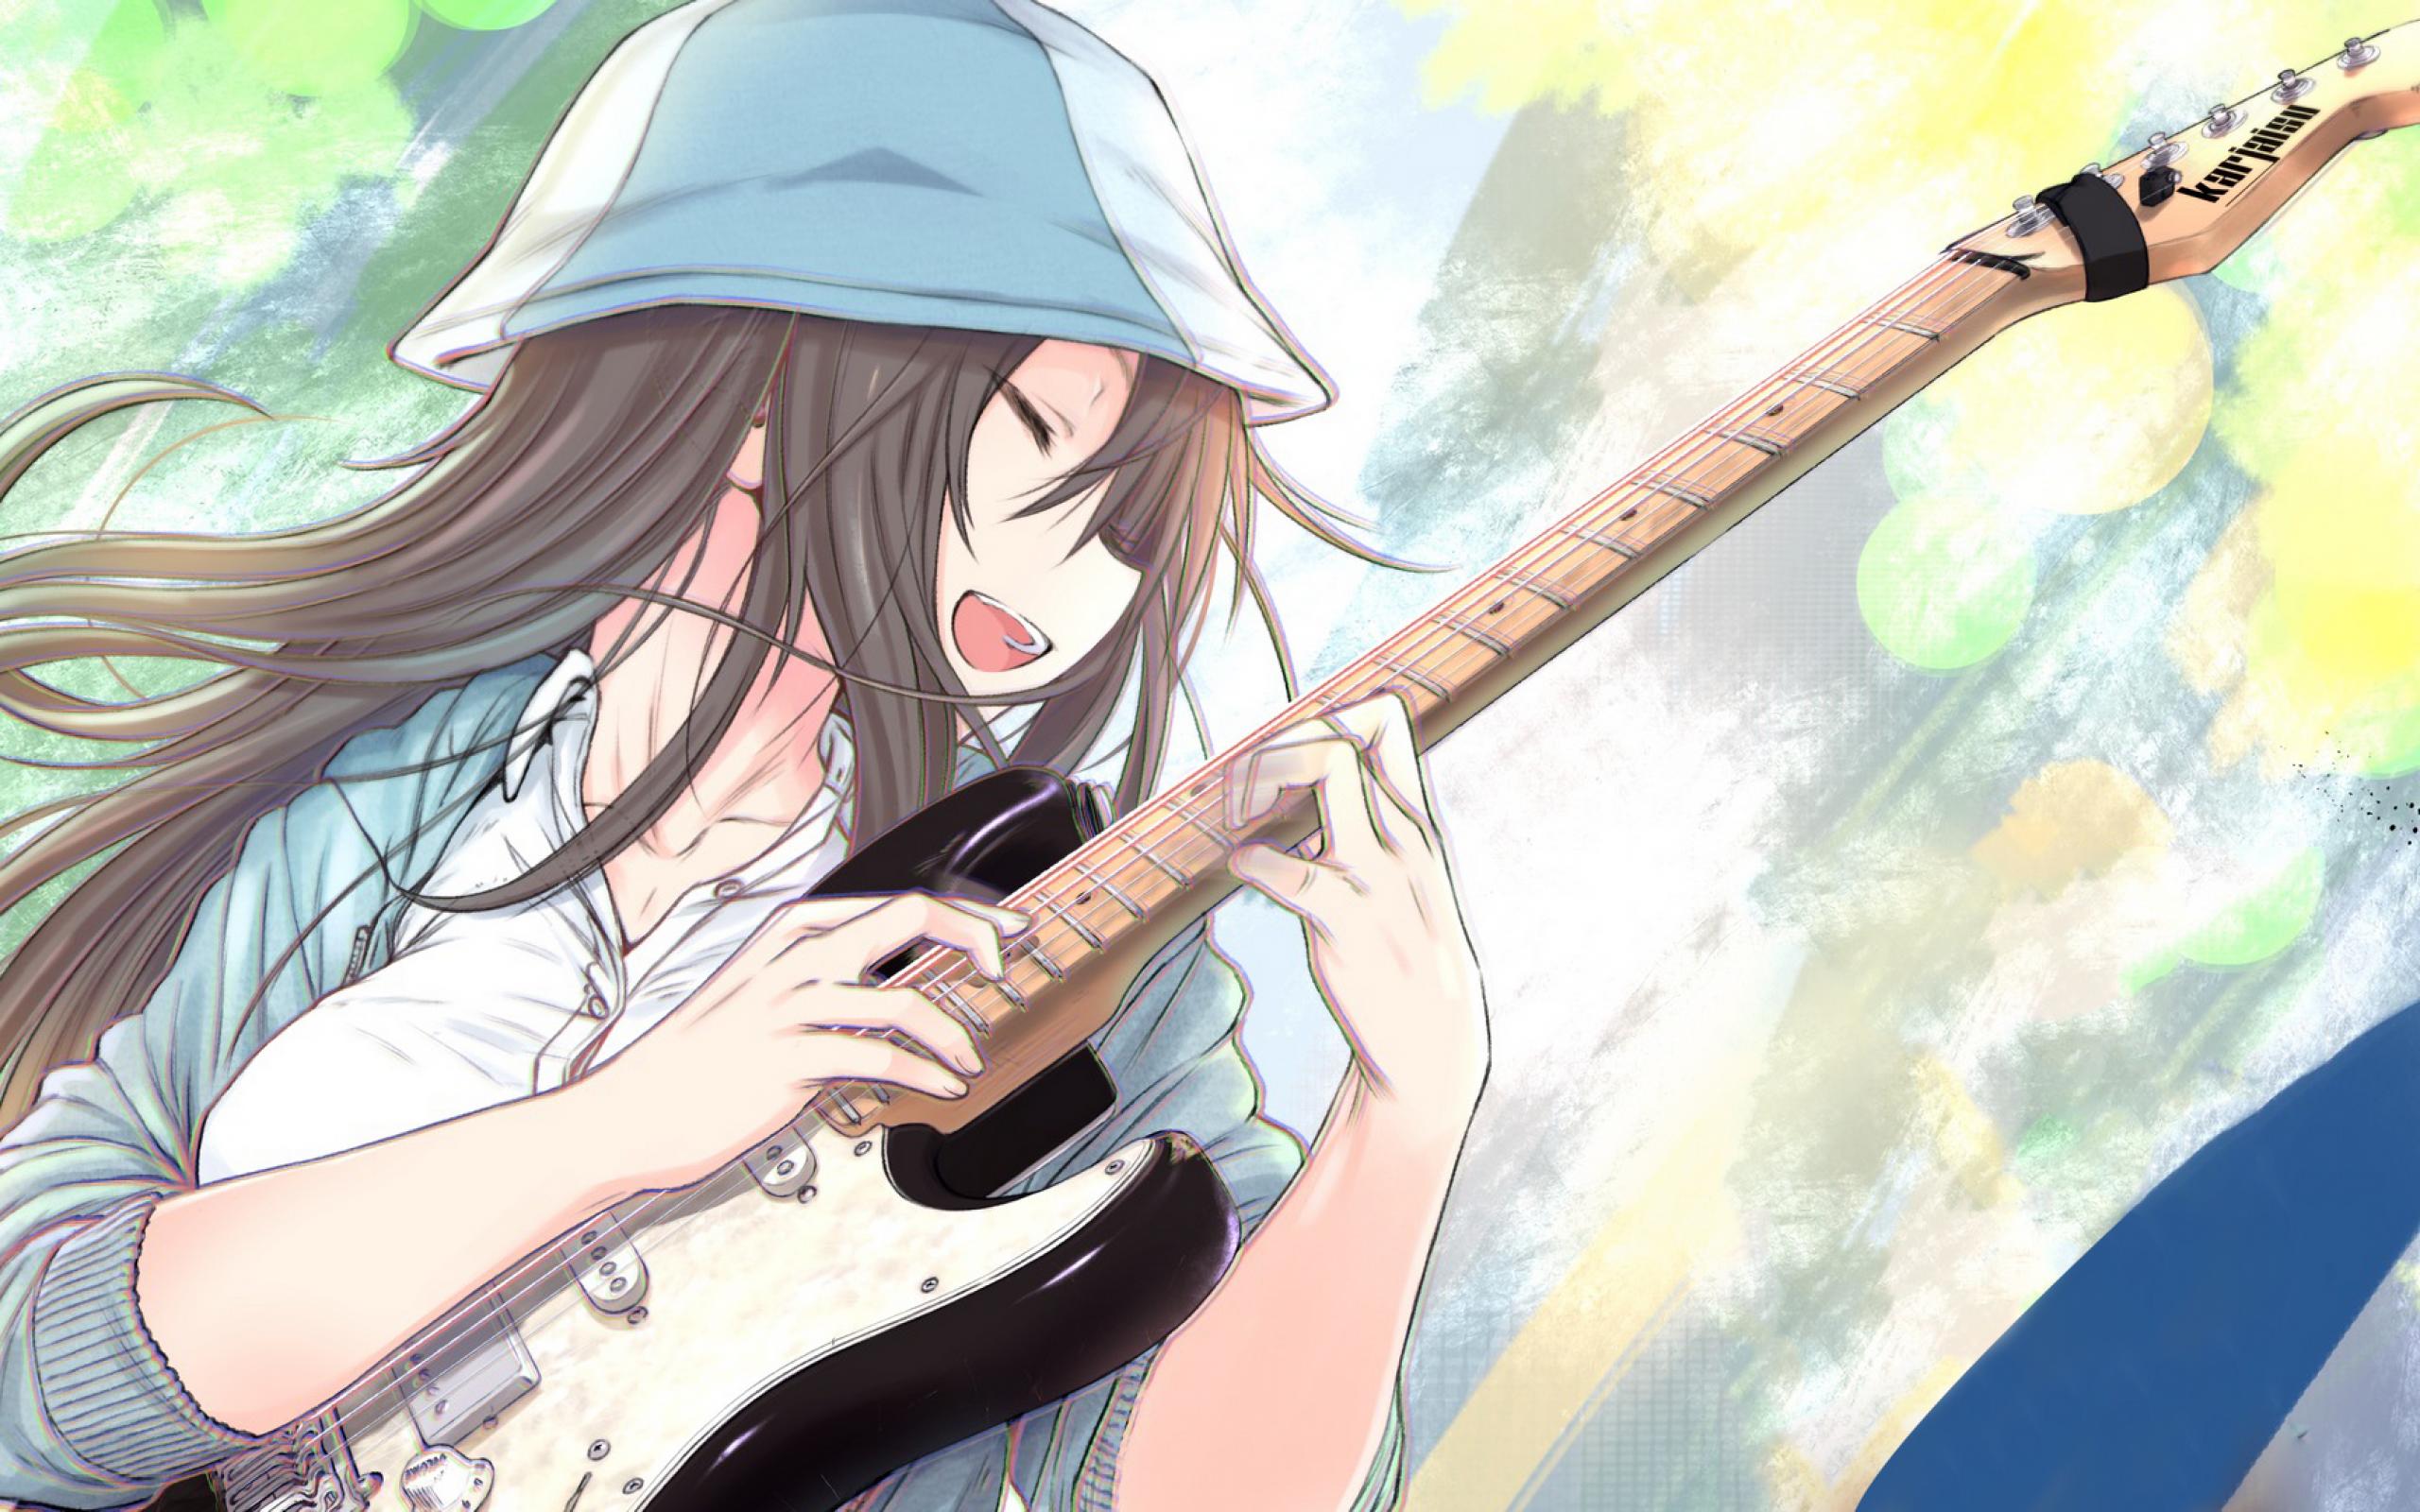 Guitar Anime Girl Wallpapers - Wallpaper Cave